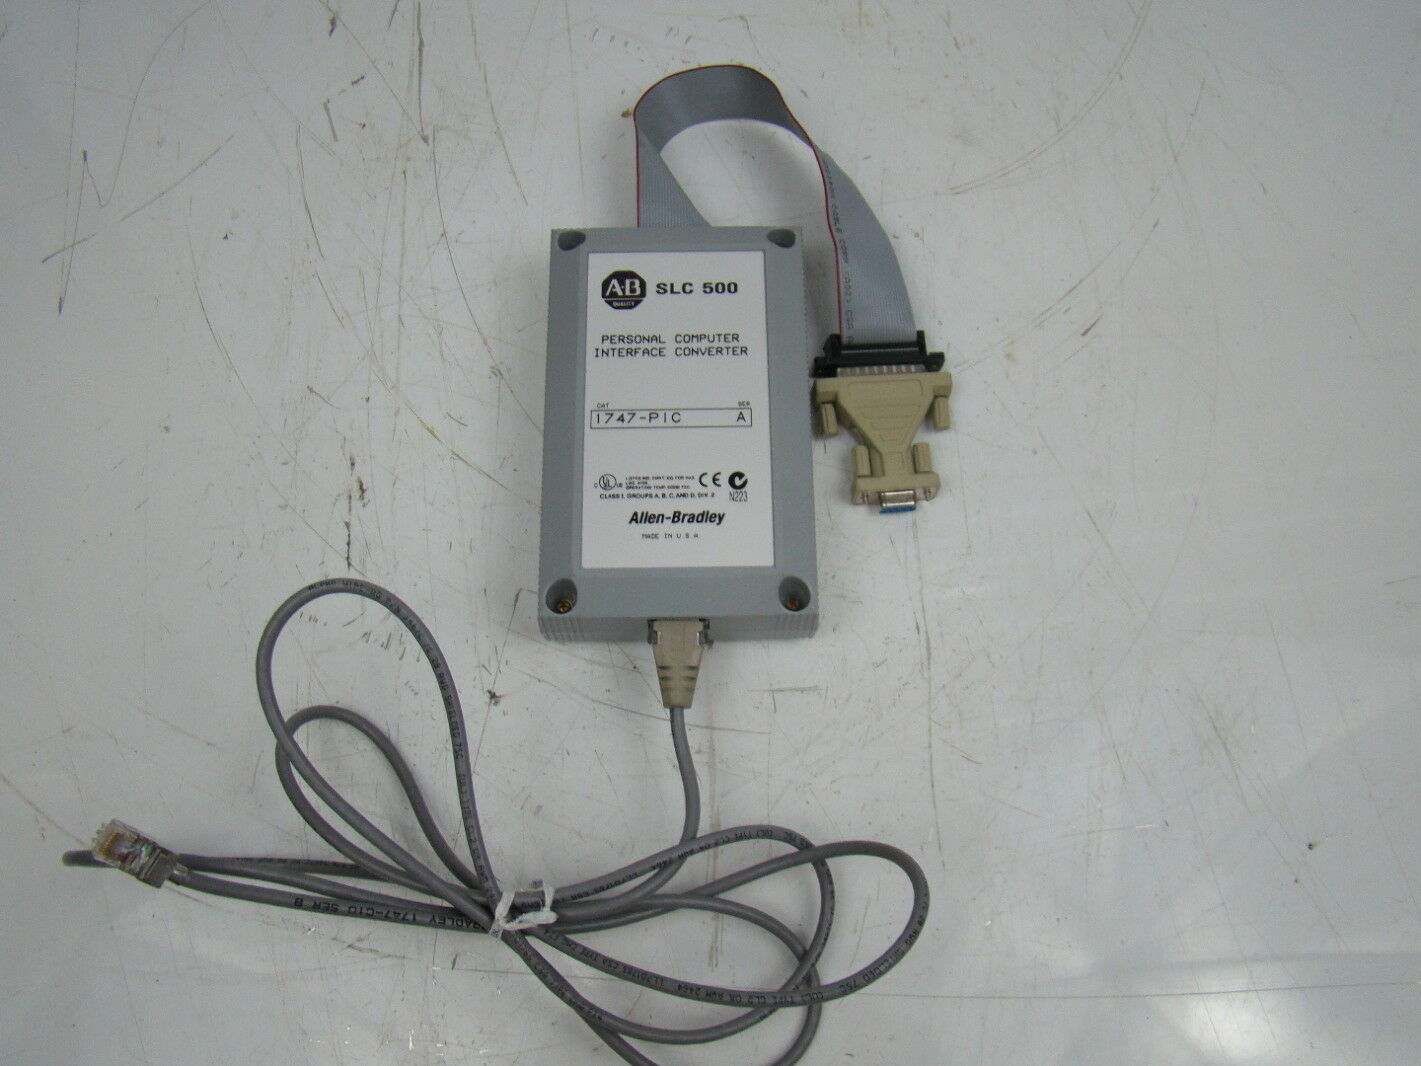 Allen-Bradley SLC 500 Personal Computer Interface COnverter 24 VDC 1747-PIC